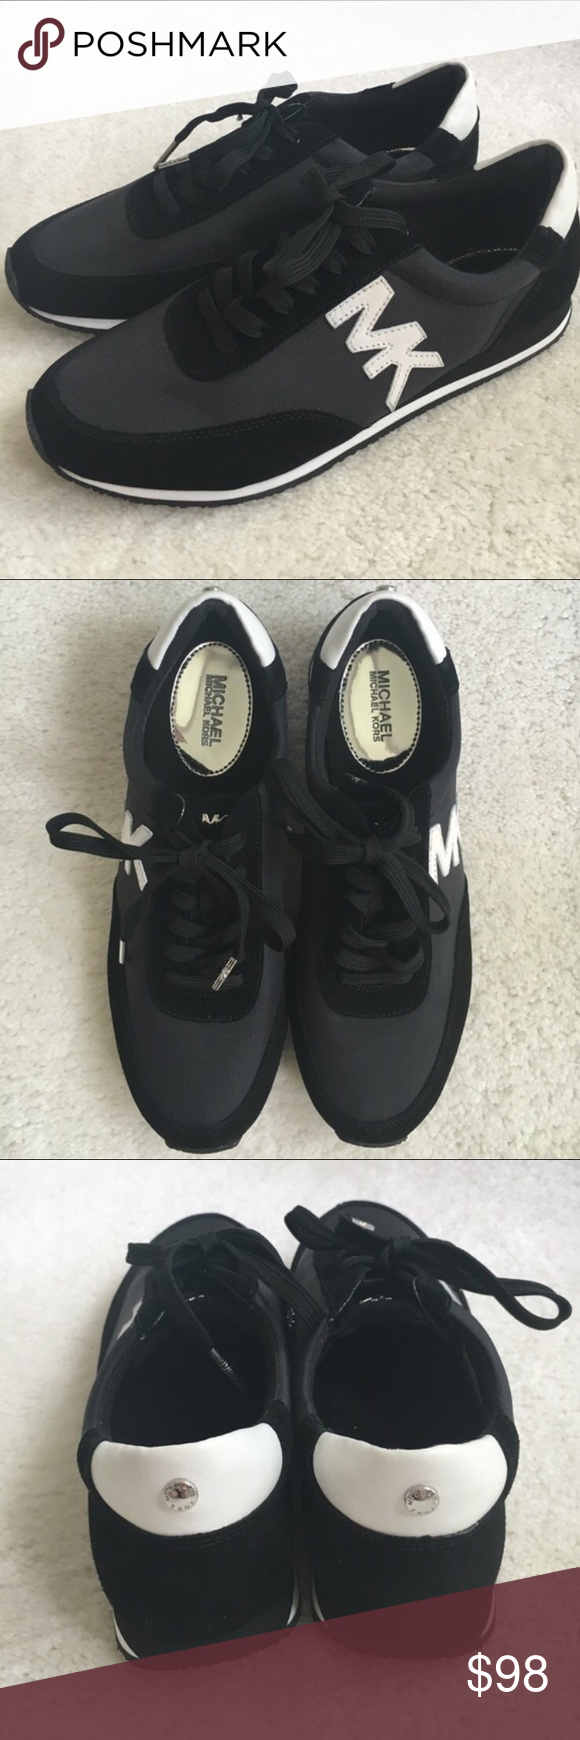 MICHAEL KORS sneakers NWOT/Authentic